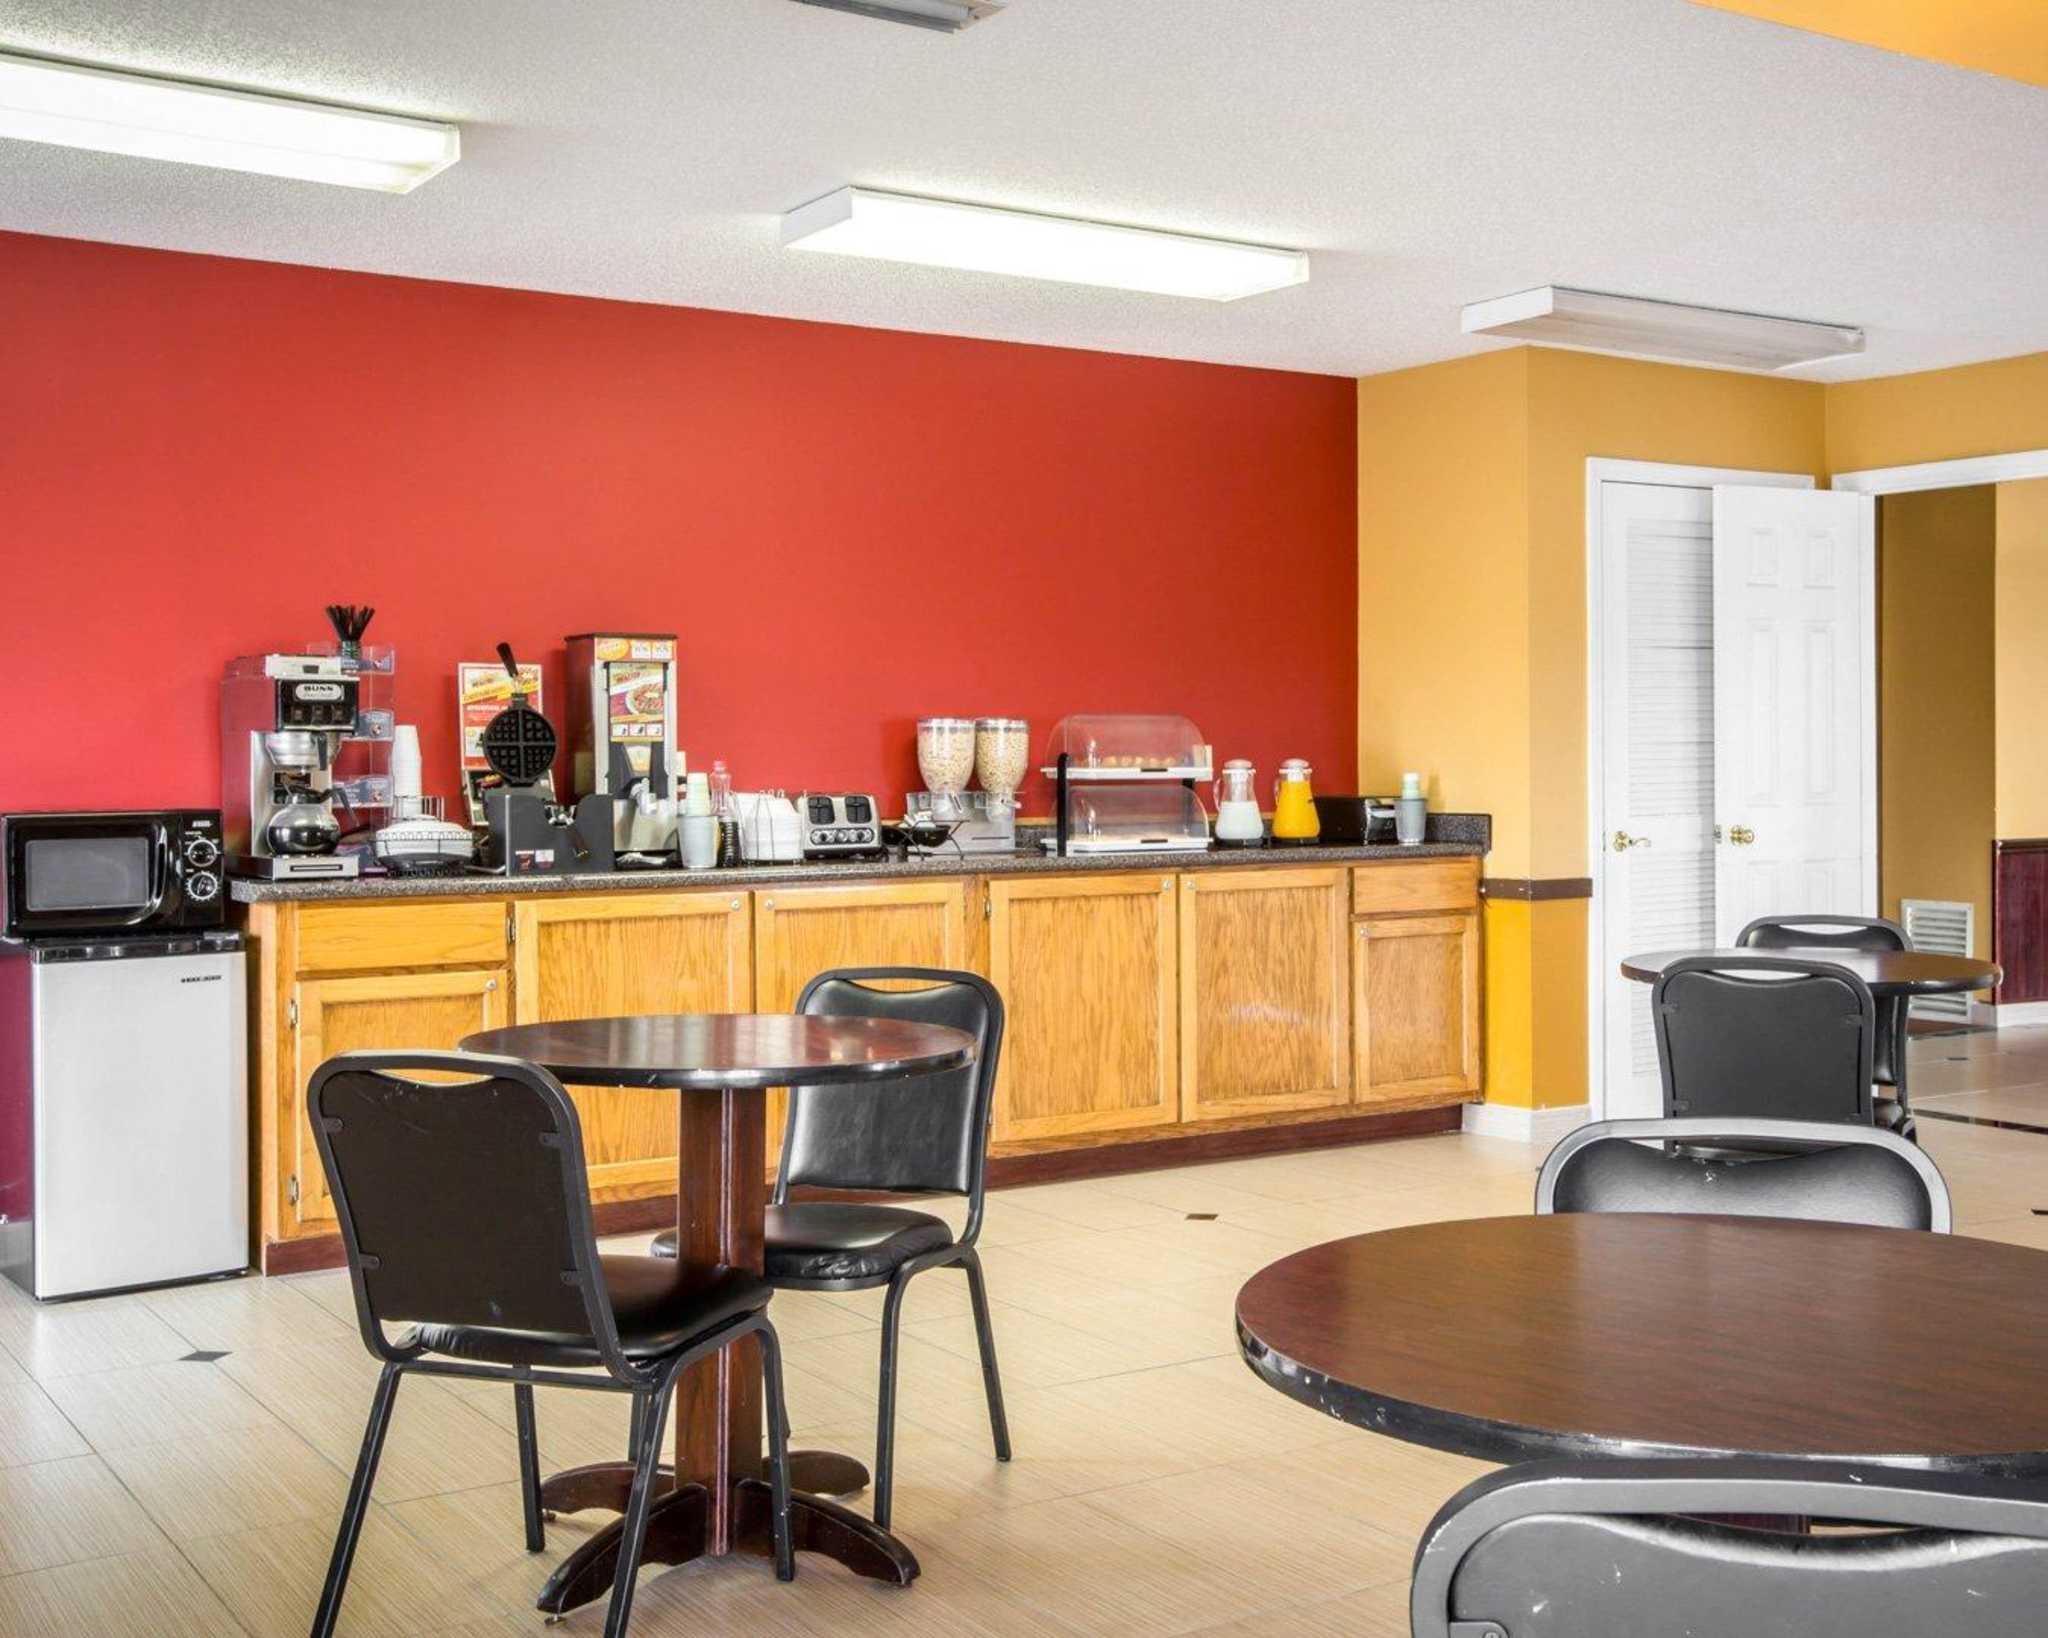 Econo Lodge image 20